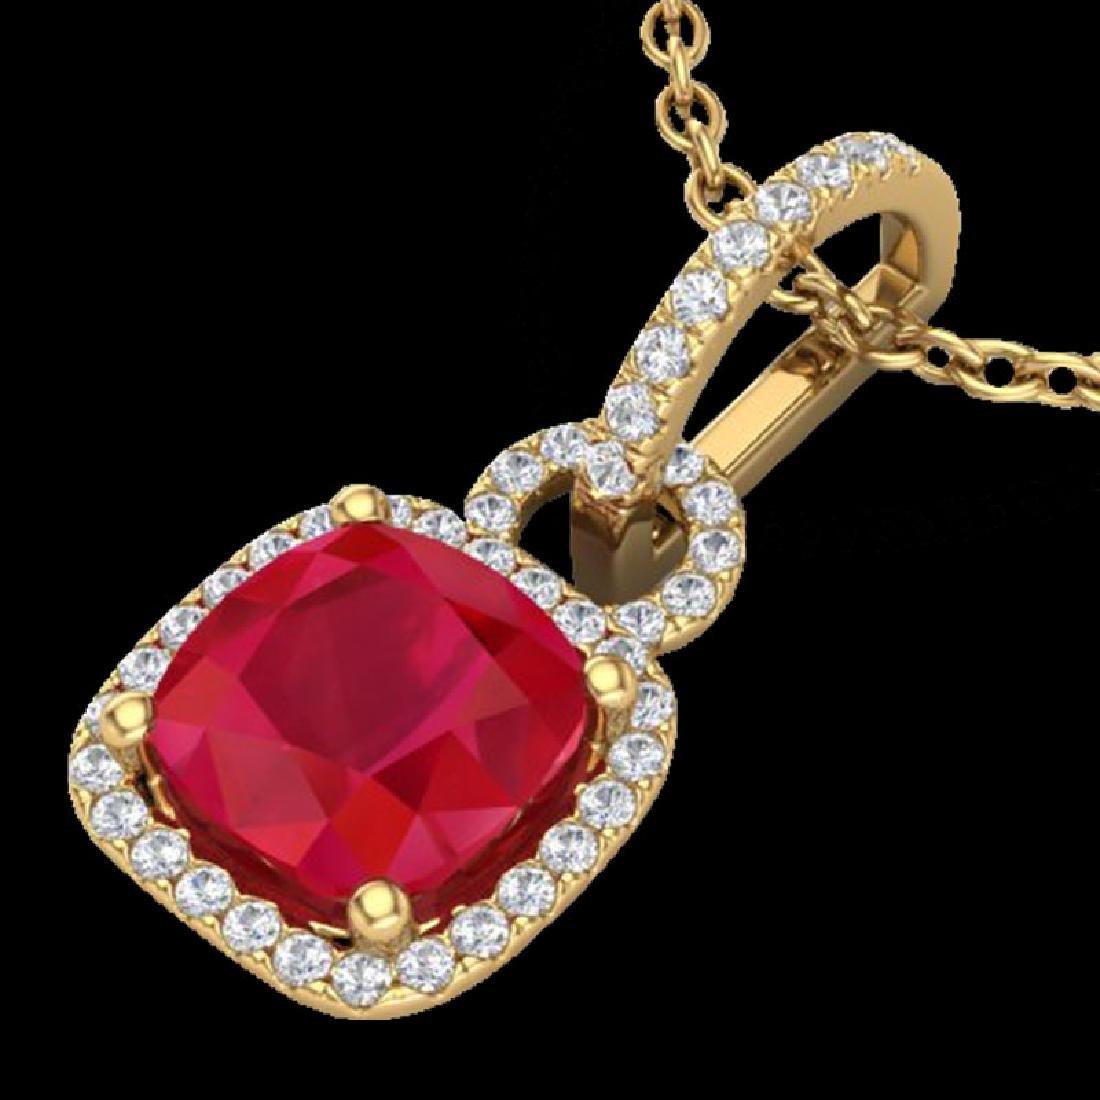 3 CTW Ruby & Micro VS/SI Diamond Necklace 18K Yellow